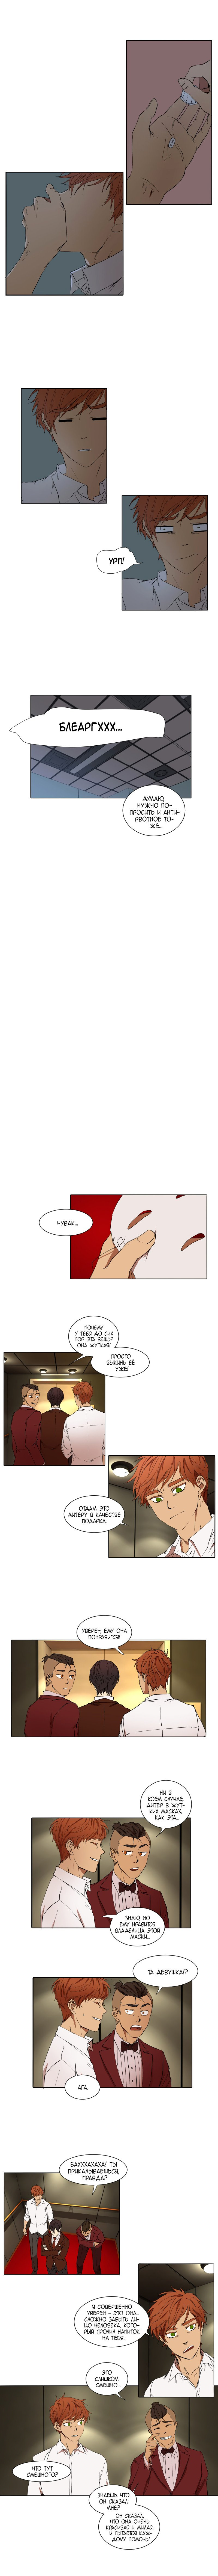 Манга Я люблю Ю / I love Yoo  - Том 1 Глава 9 Страница 8